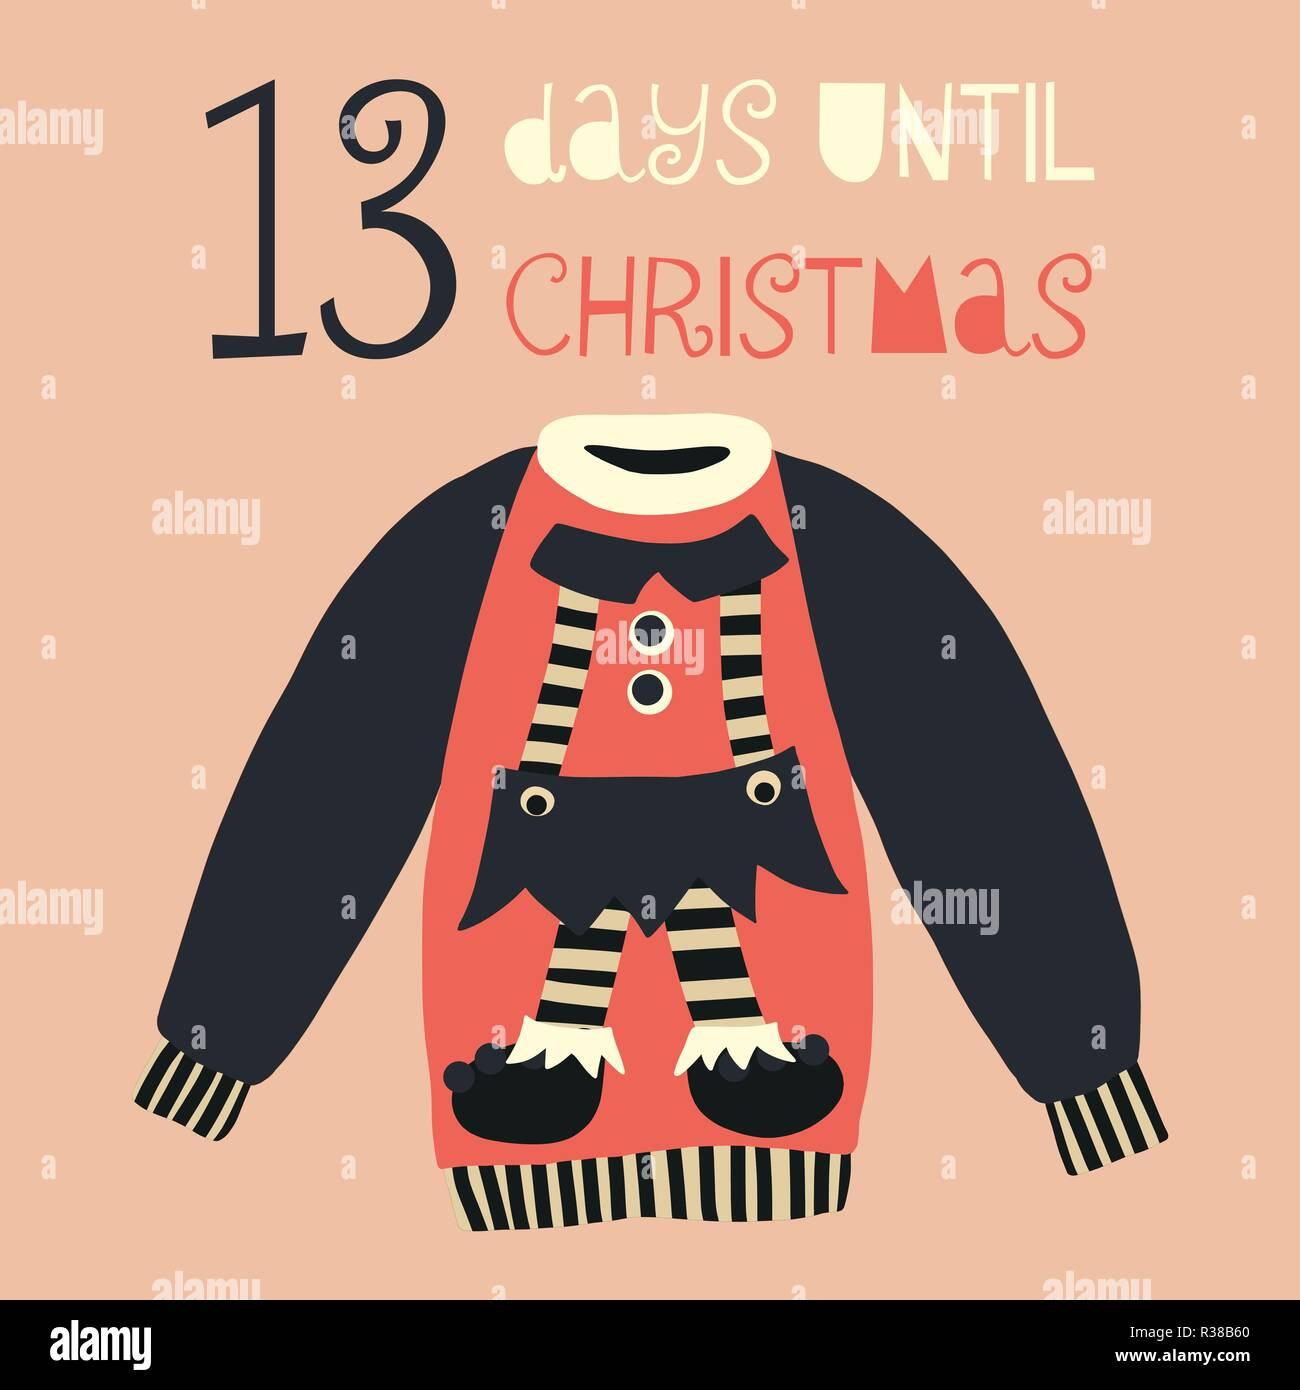 How Long Till Christmas.13 Days Until Christmas Vector Illustration Christmas